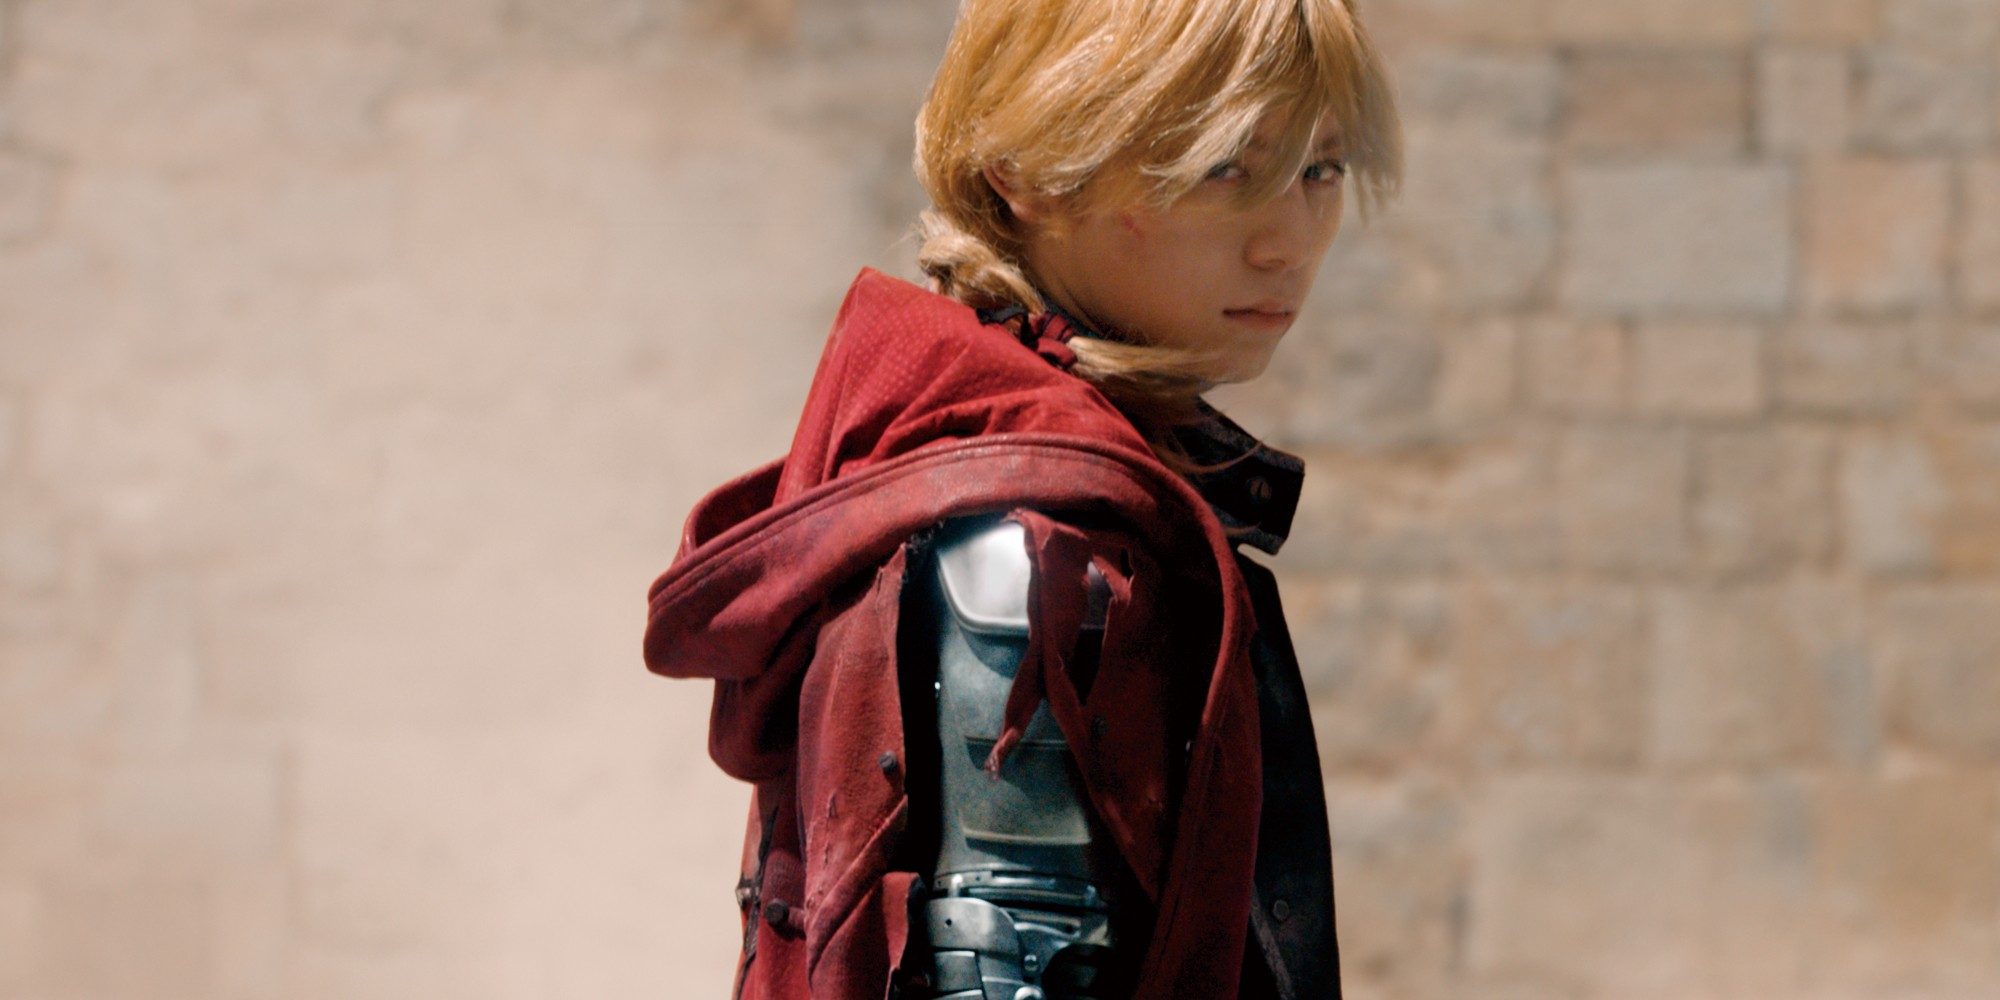 Fullmetal Alchemist Movie Gets A New Trailer | Screen Rant